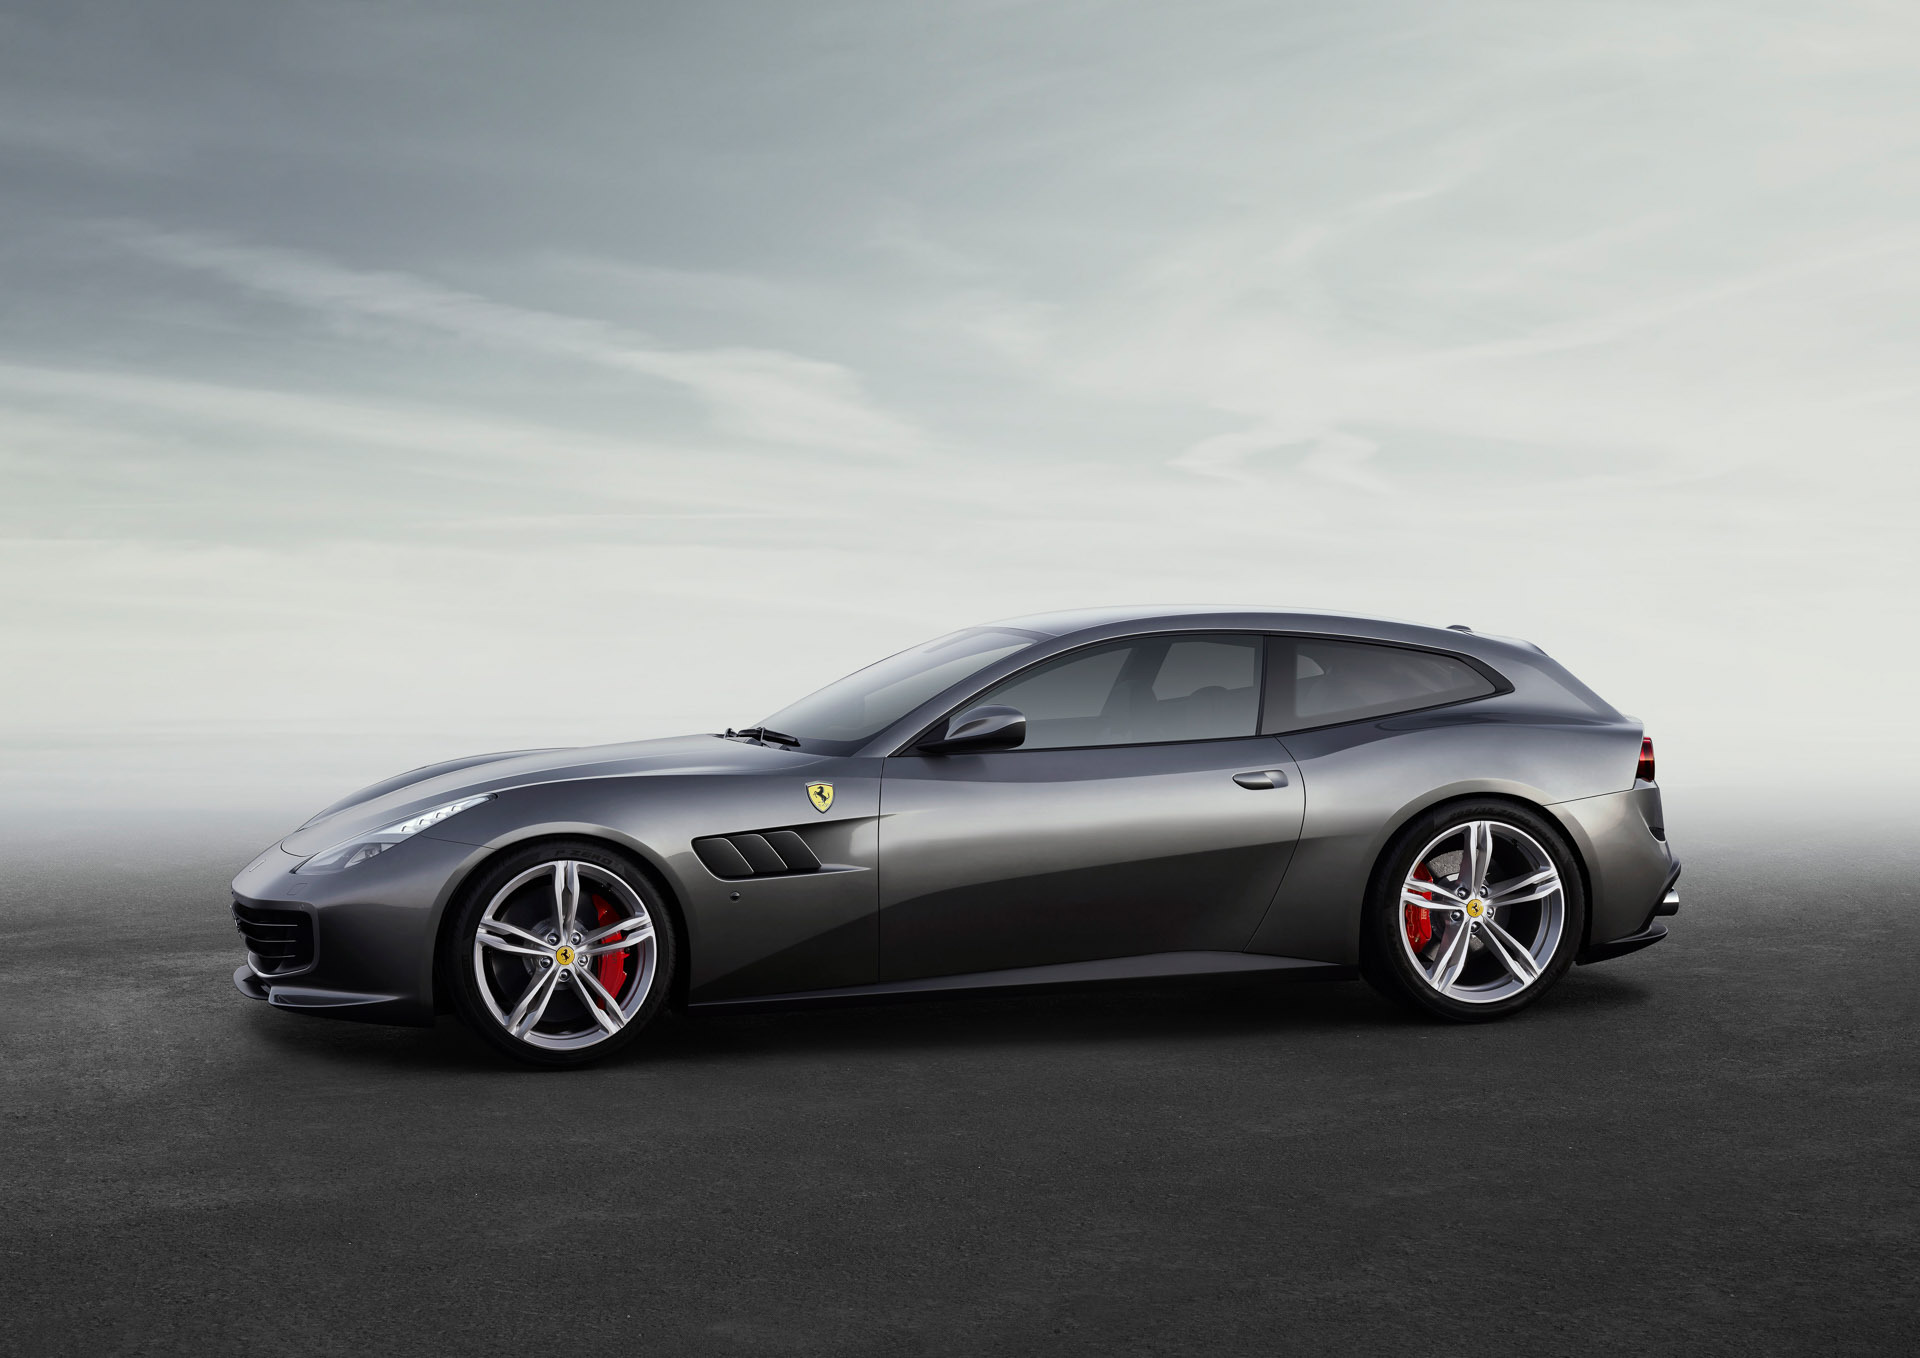 Ferrari GTC4Lusso Widescreen